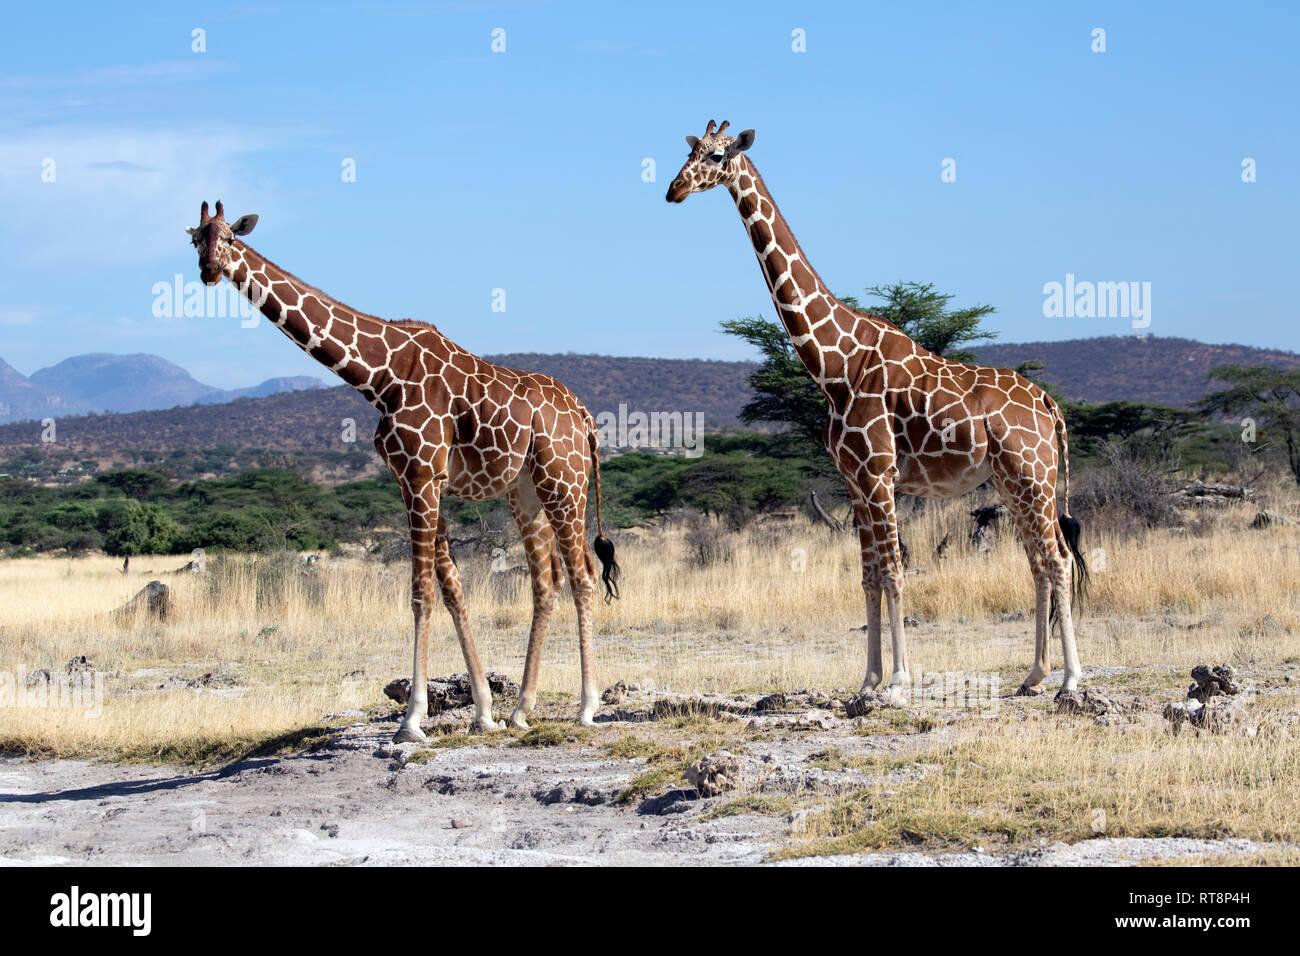 Deux somaliens ou réticulée, girafe Giraffa camelopardalis reticulata, dans des prairies semi-arides, Buffalo Springs National Reserve, Kenya Banque D'Images